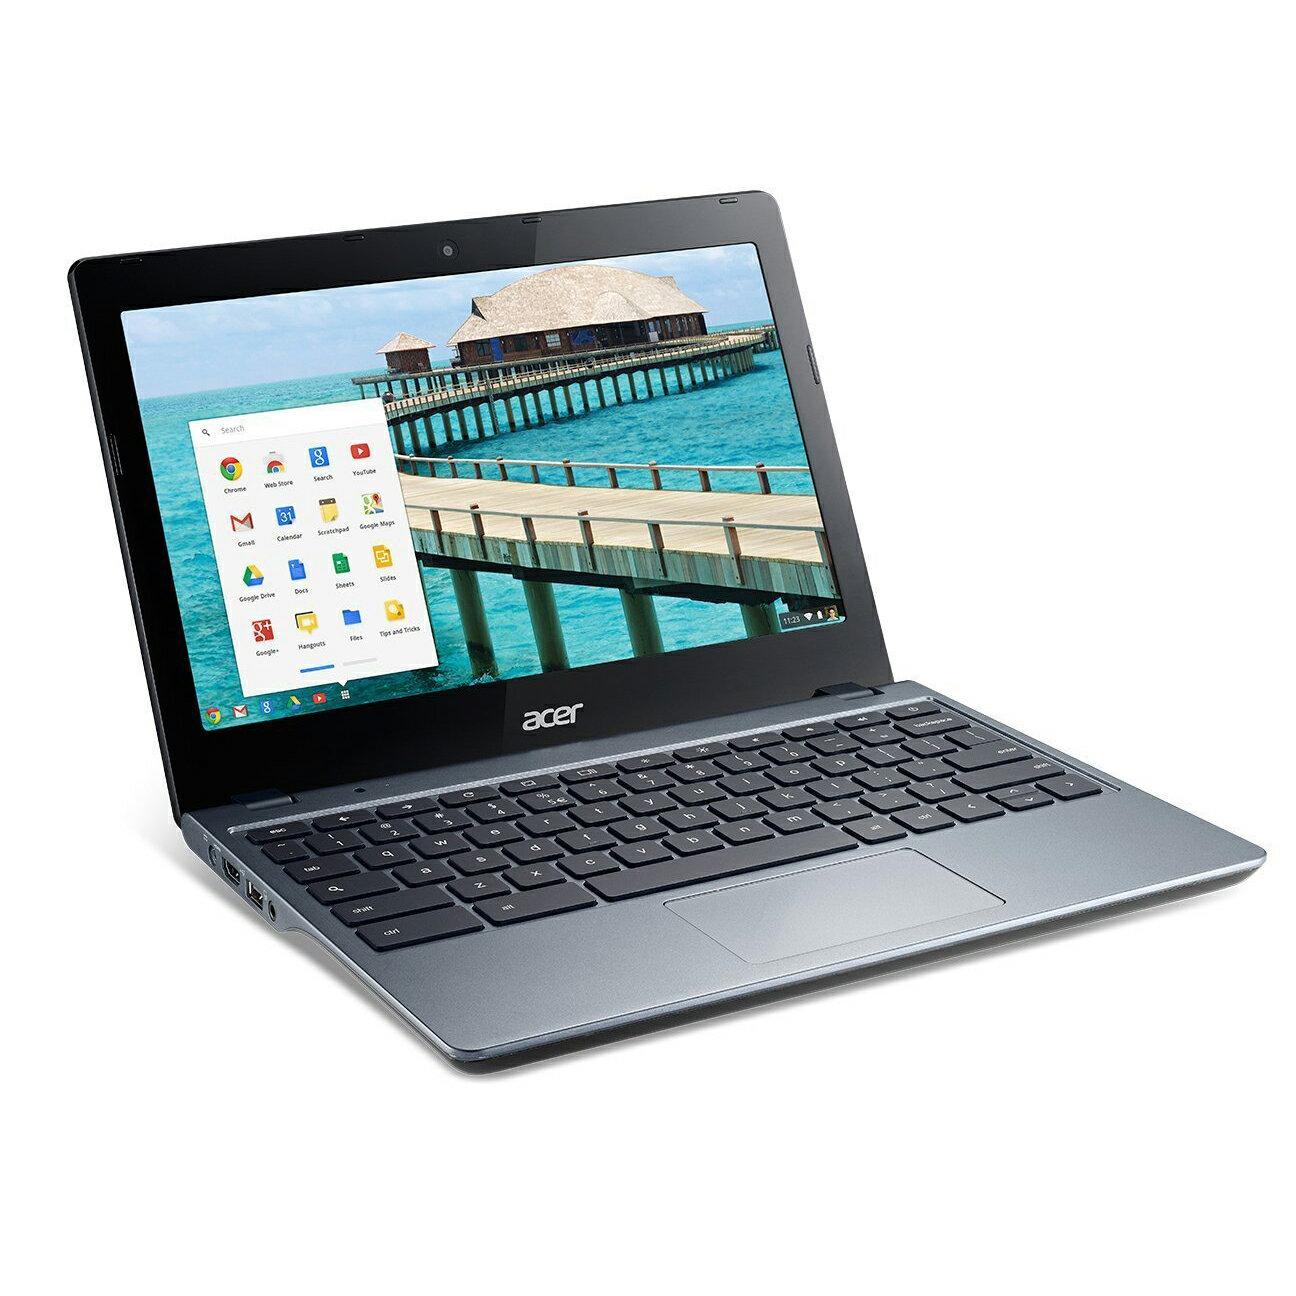 Acer C720 Google Chromebook Notebook Laptop 11.6-Inch LED 4GB RAM 16GB SSD 2